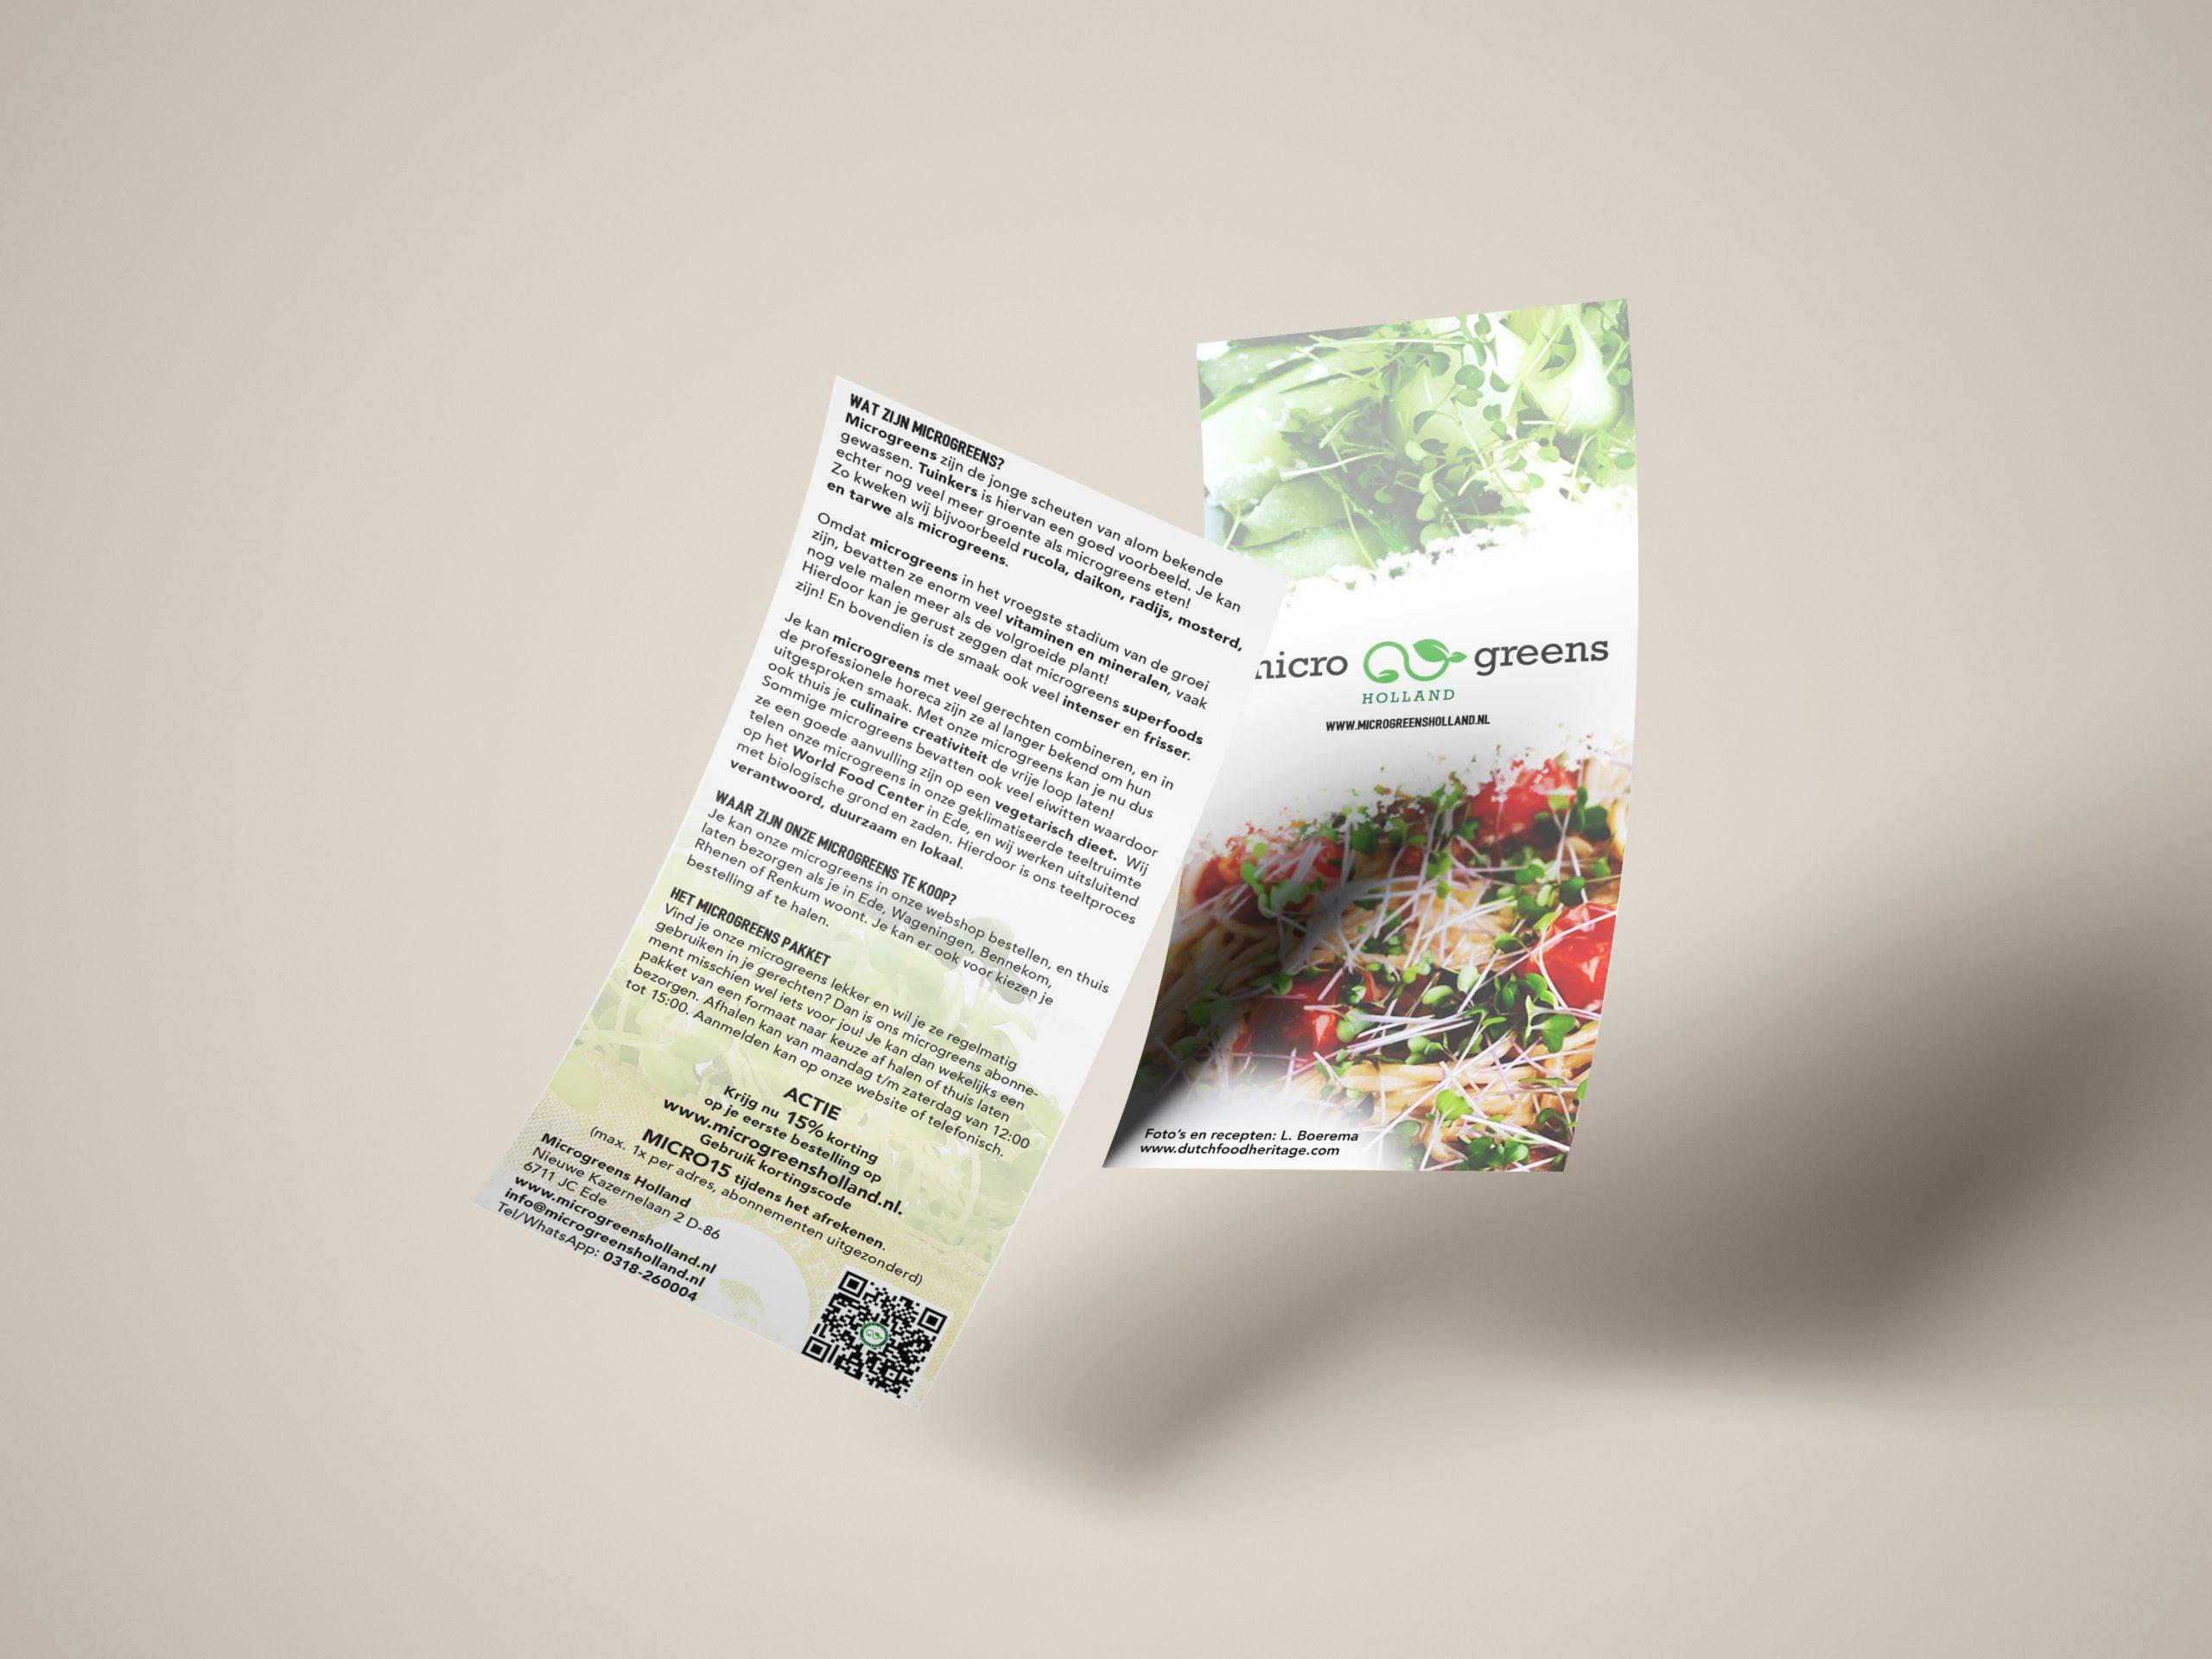 Microgreens Holland